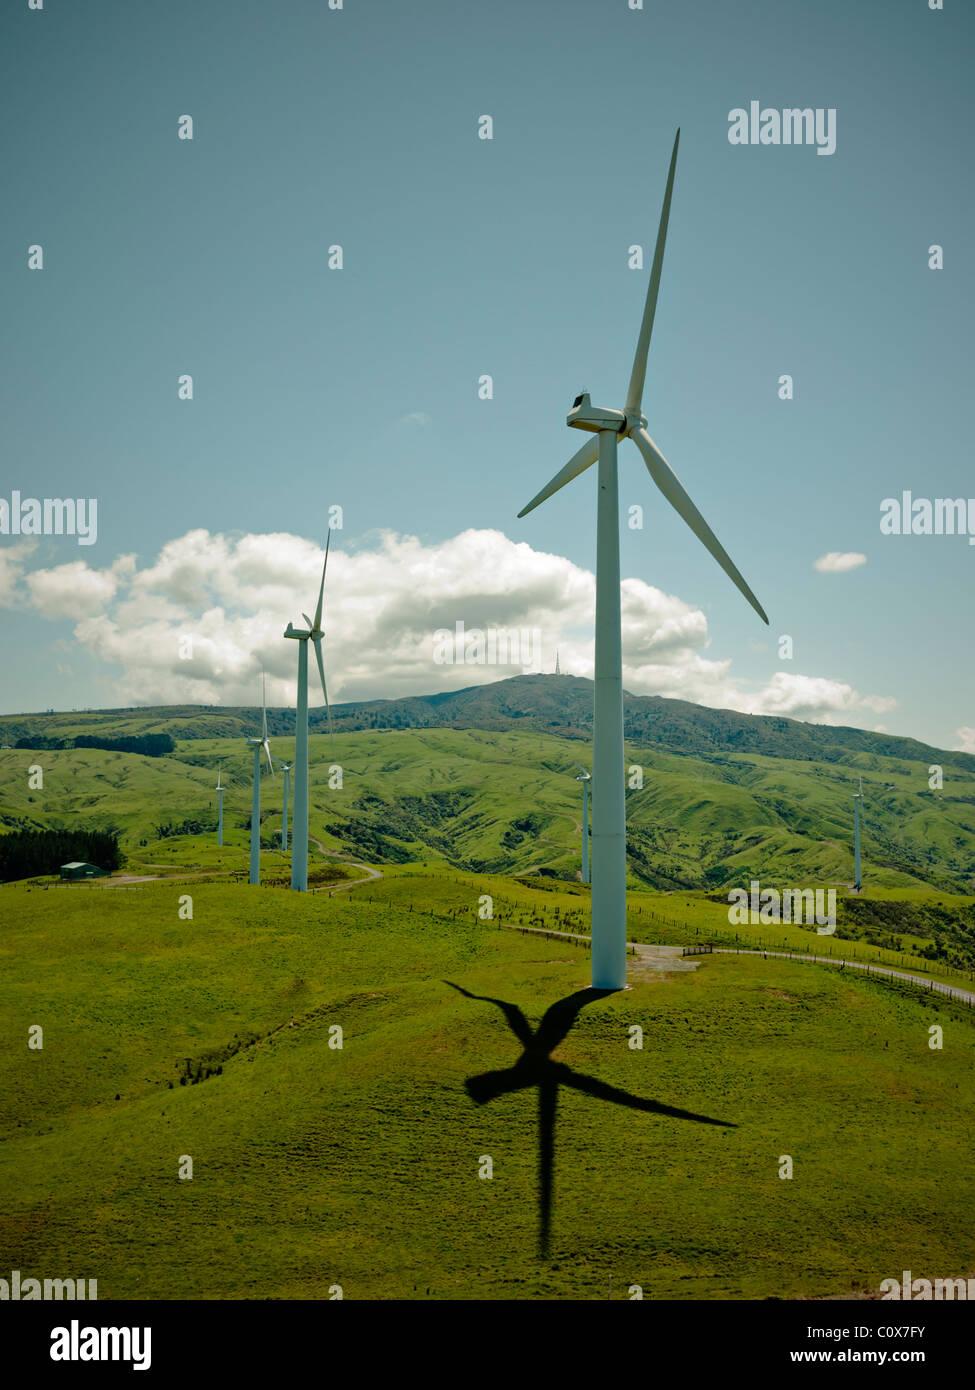 Wind turbine, Te Apiti wind farm, New Zealand. - Stock Image